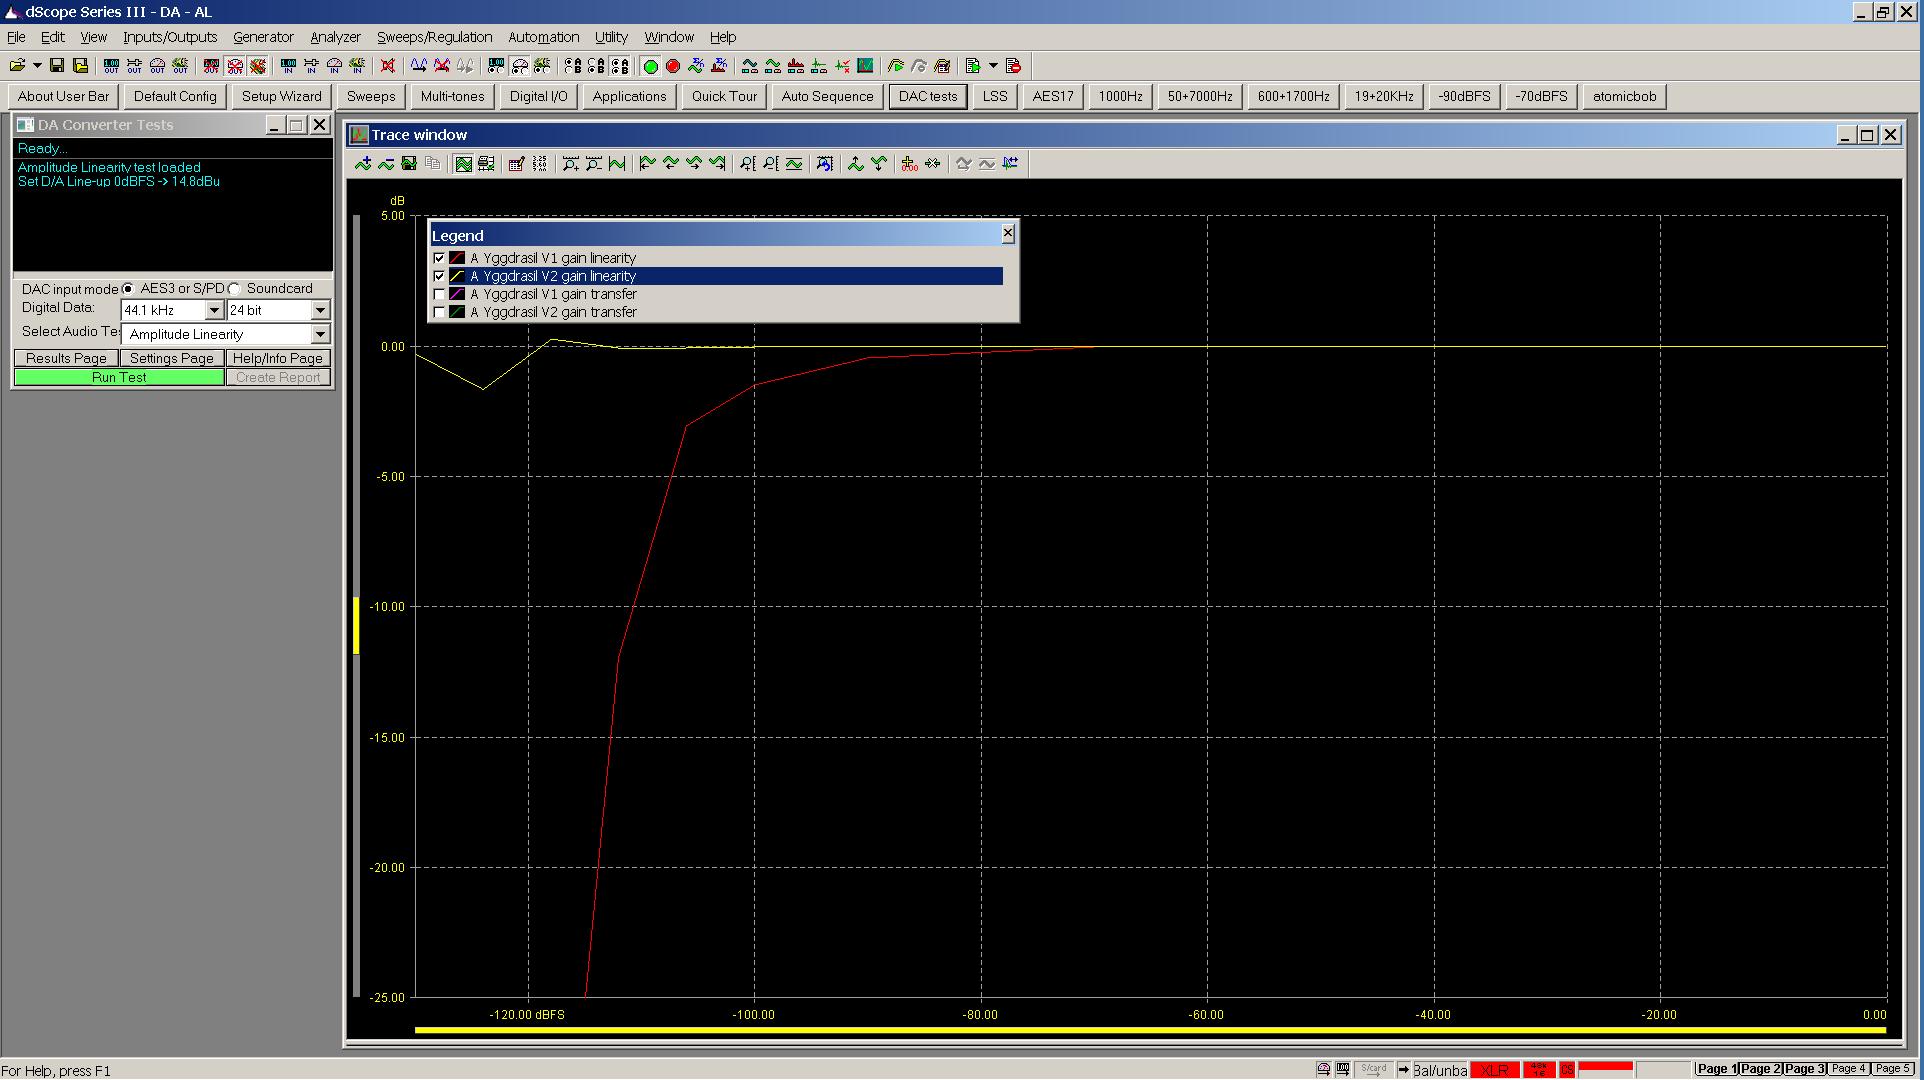 20180219 Yggdrasil V1 - V2 comparison Bal 1 KHz gain linearity  - spdif - x-axis changed.PNG